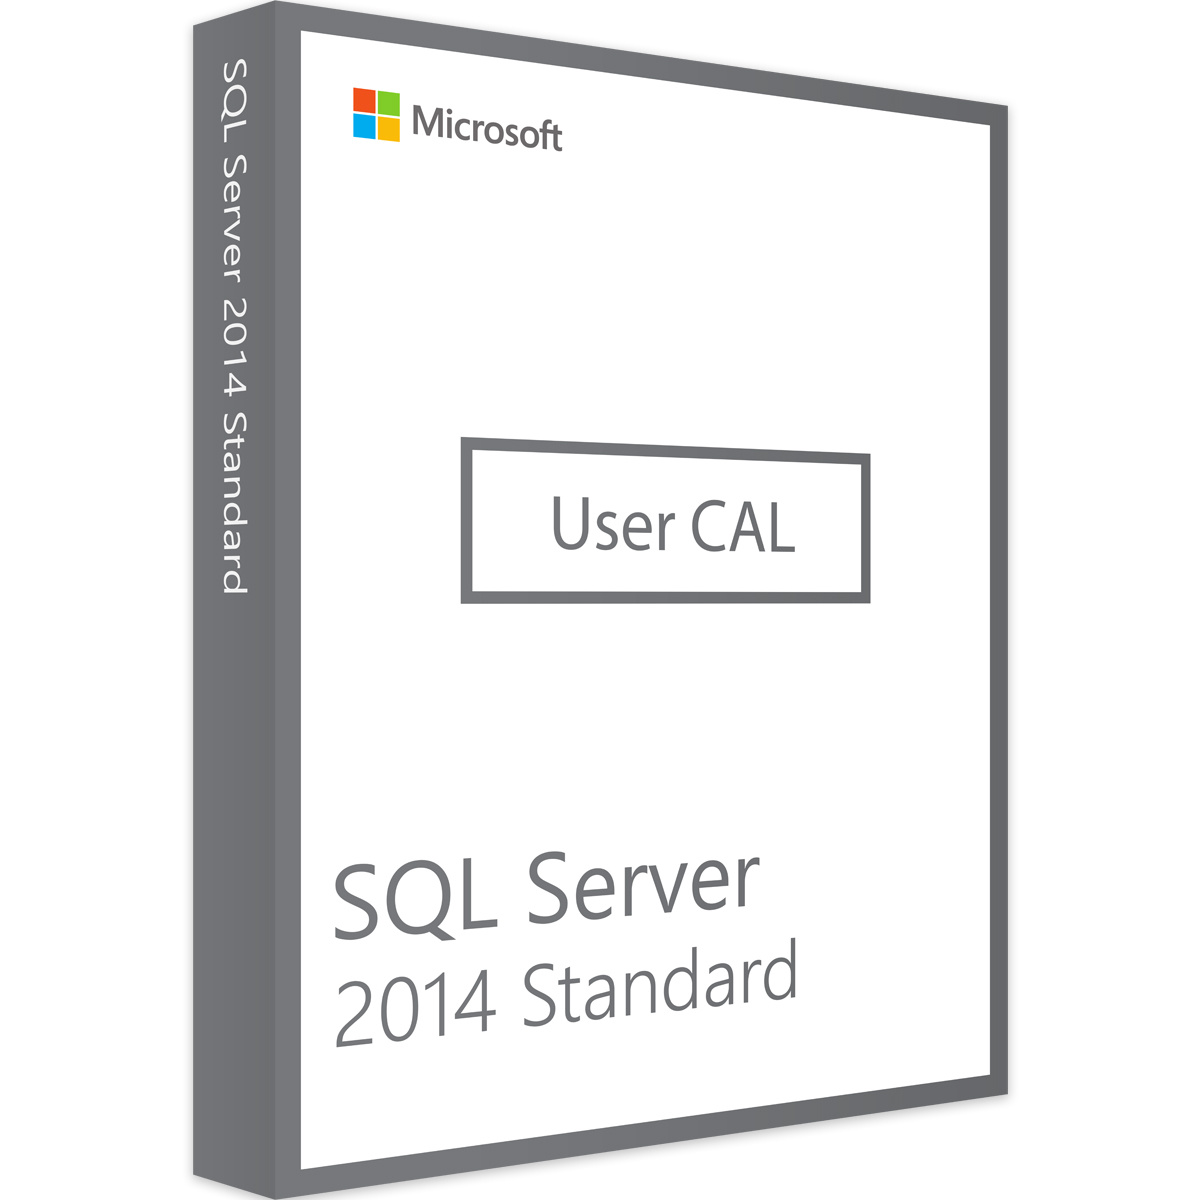 Microsoft SQL Server 2014 User CAL - Microsoft Open License